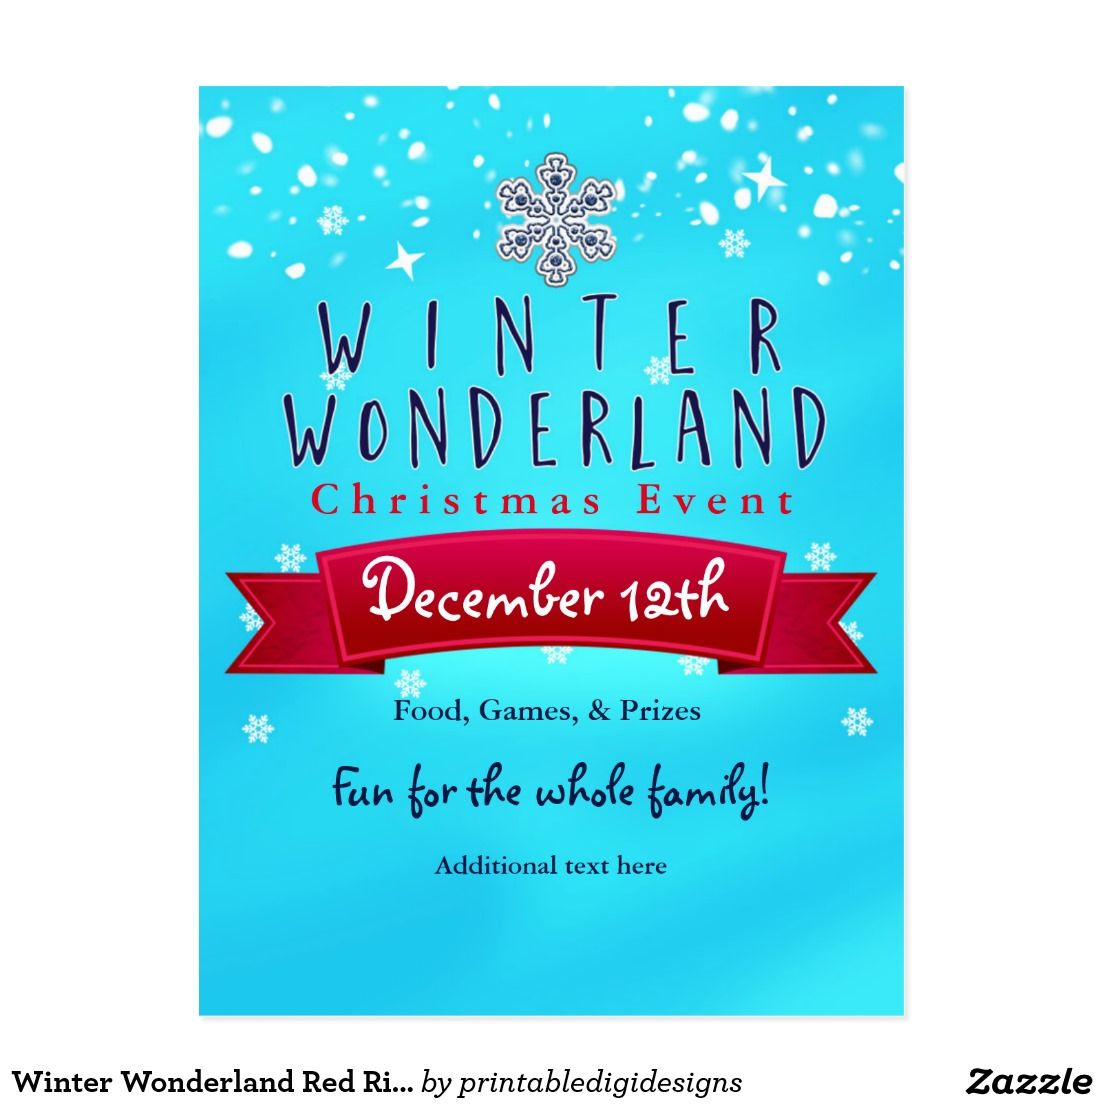 Winter Wonderland Red Ribbon Blue Holiday Postcard | Holiday postcards